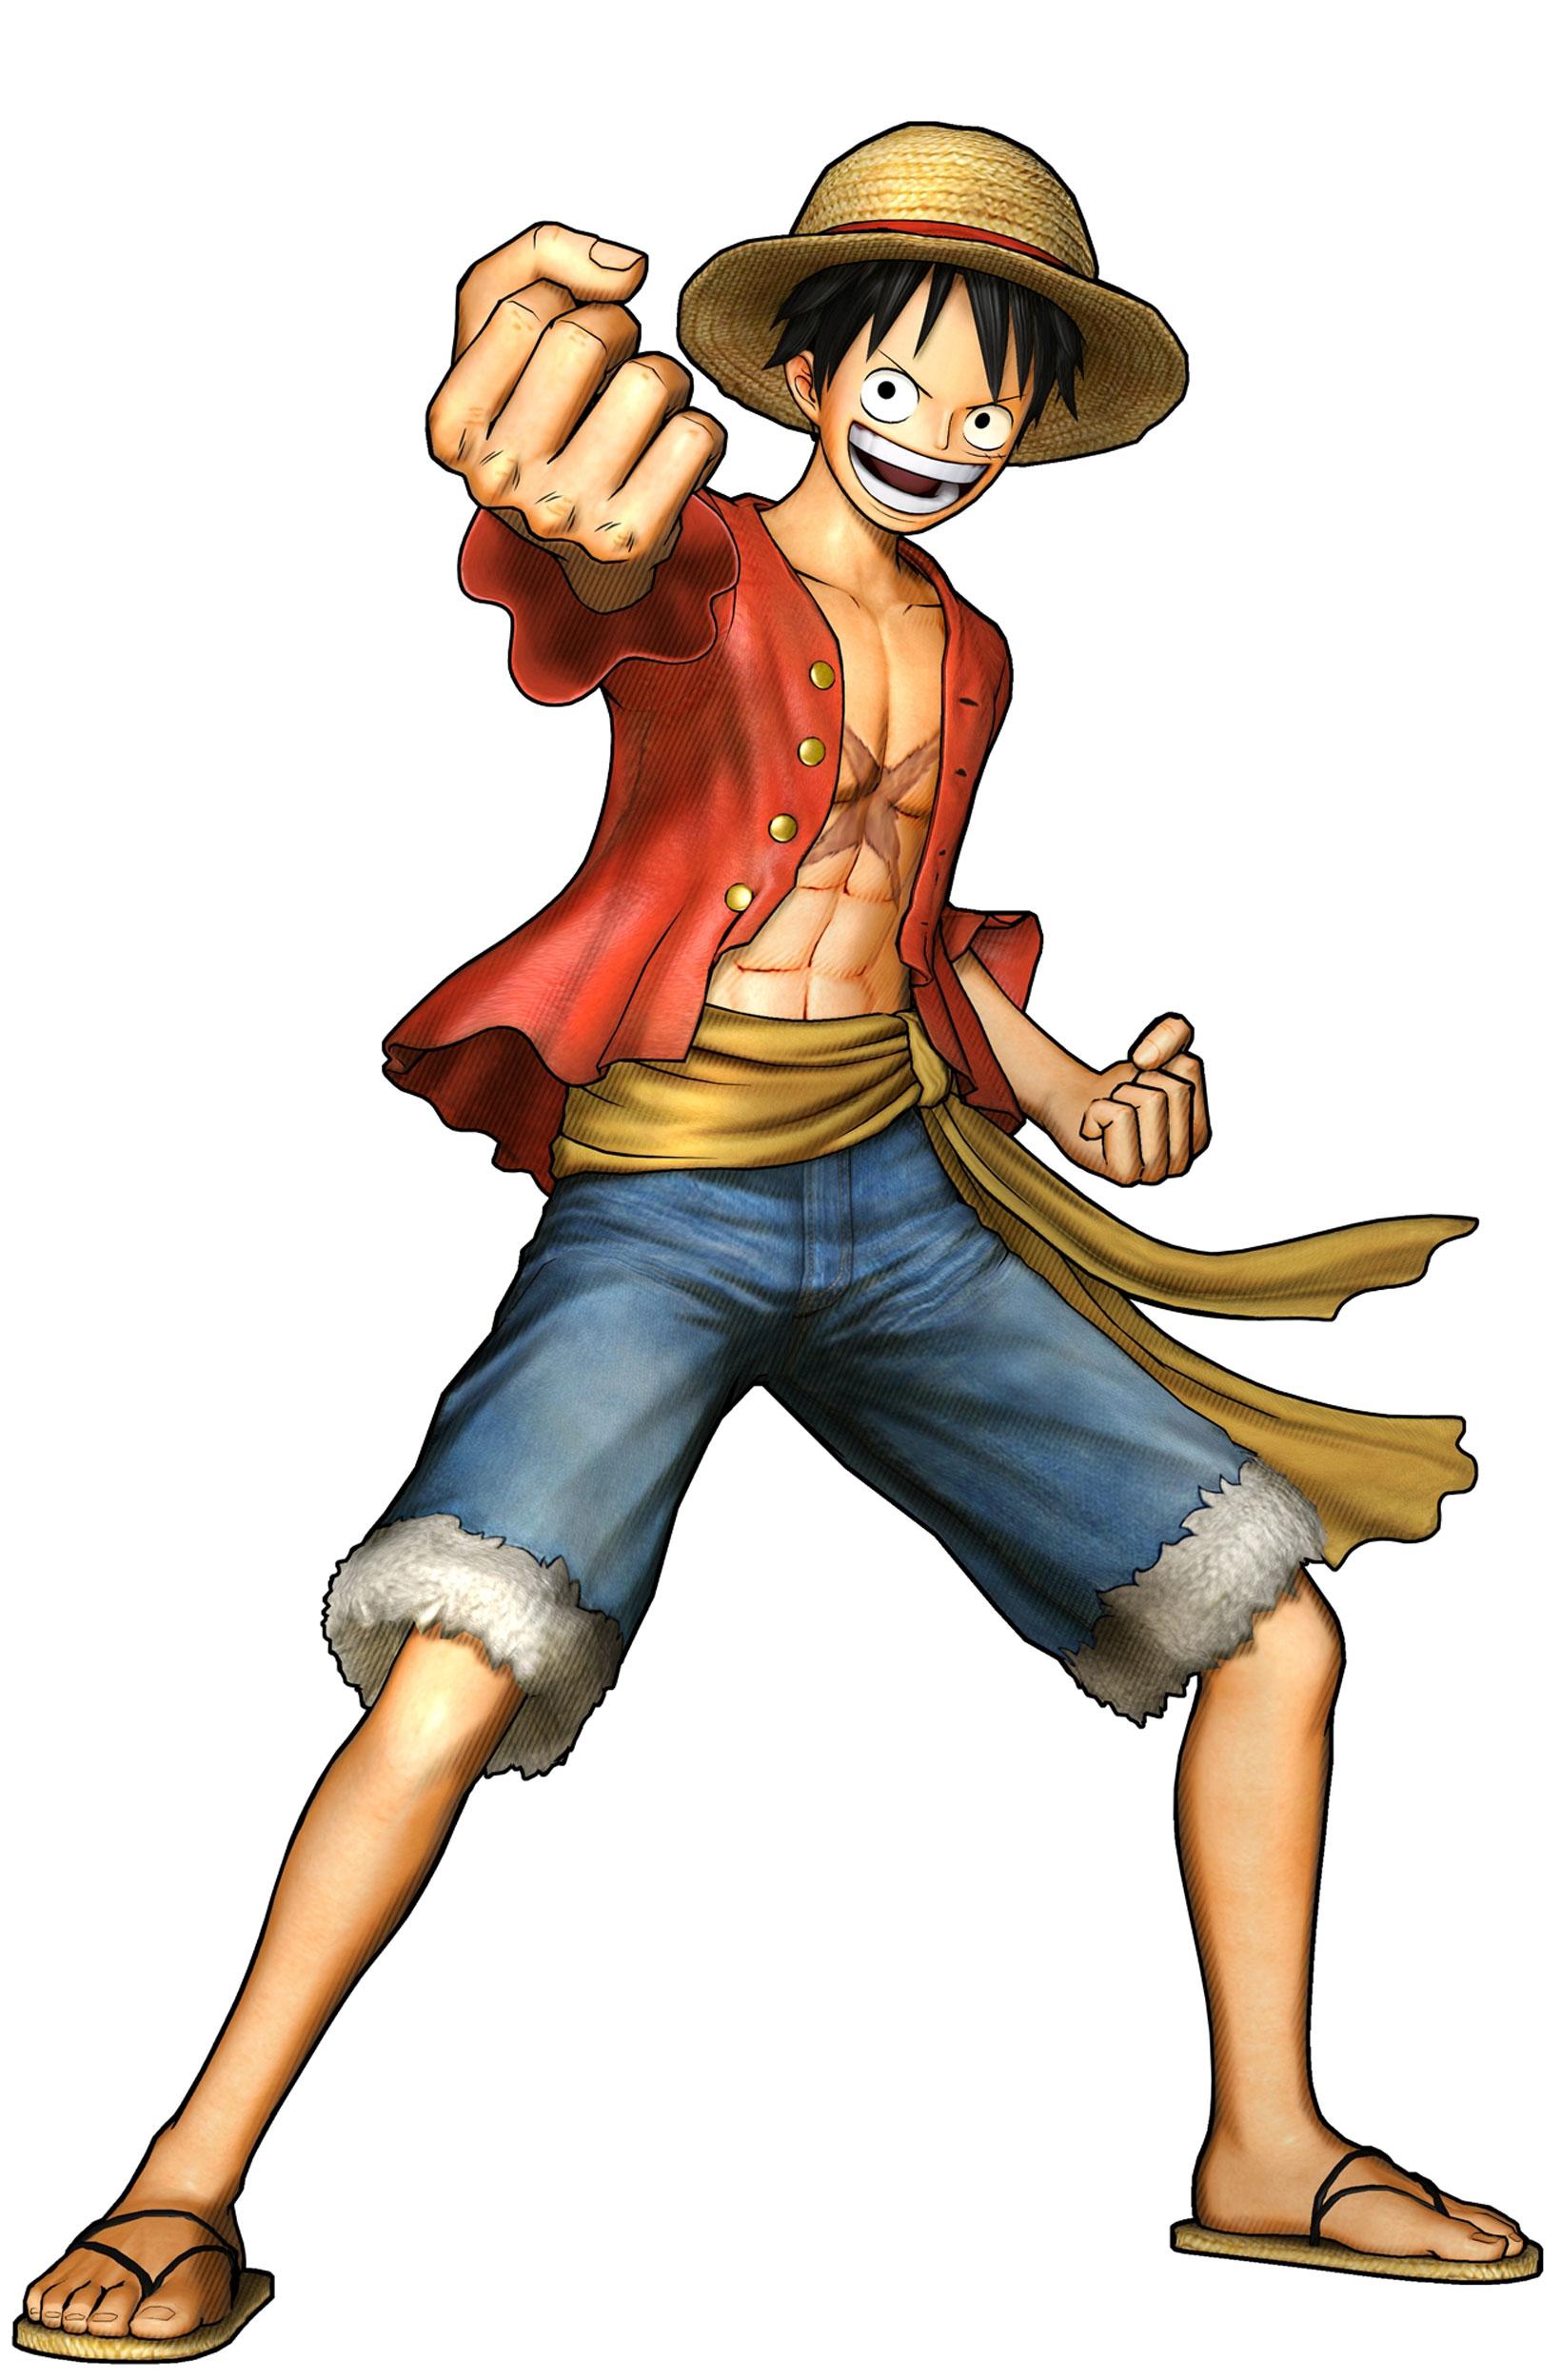 43 Gambar Luffy Keren 3d Gratis Terbaru Gambar Keren